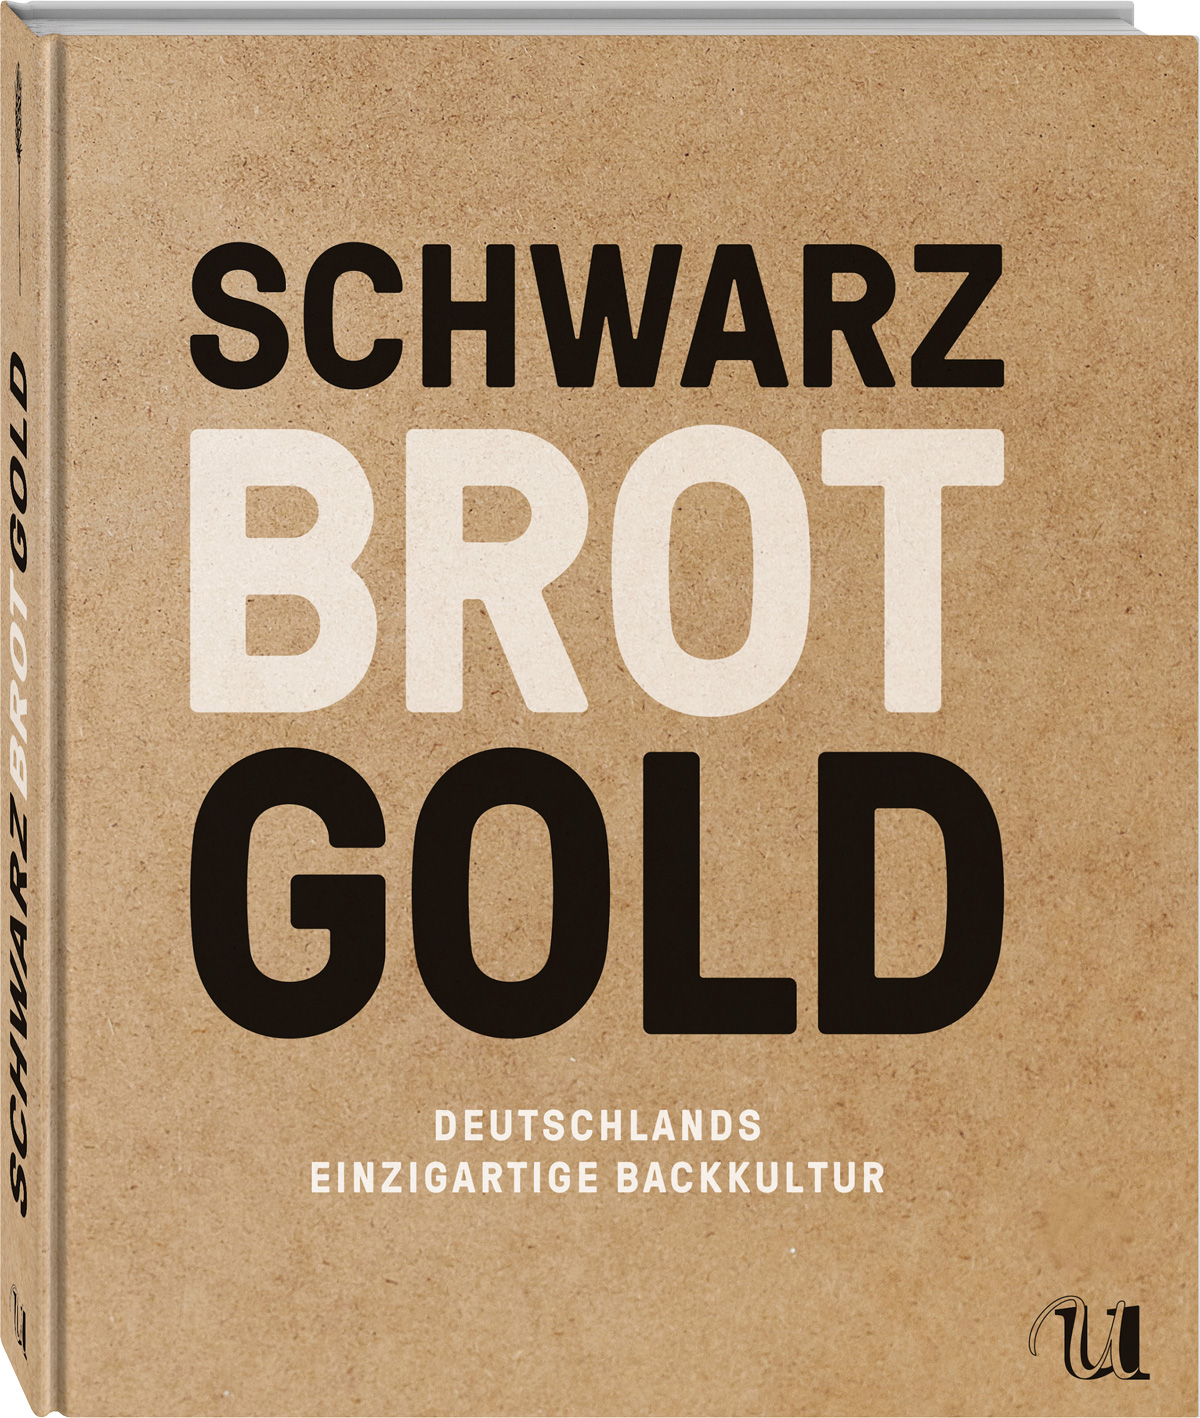 Schwarz Brot Gold Bettina Bartz